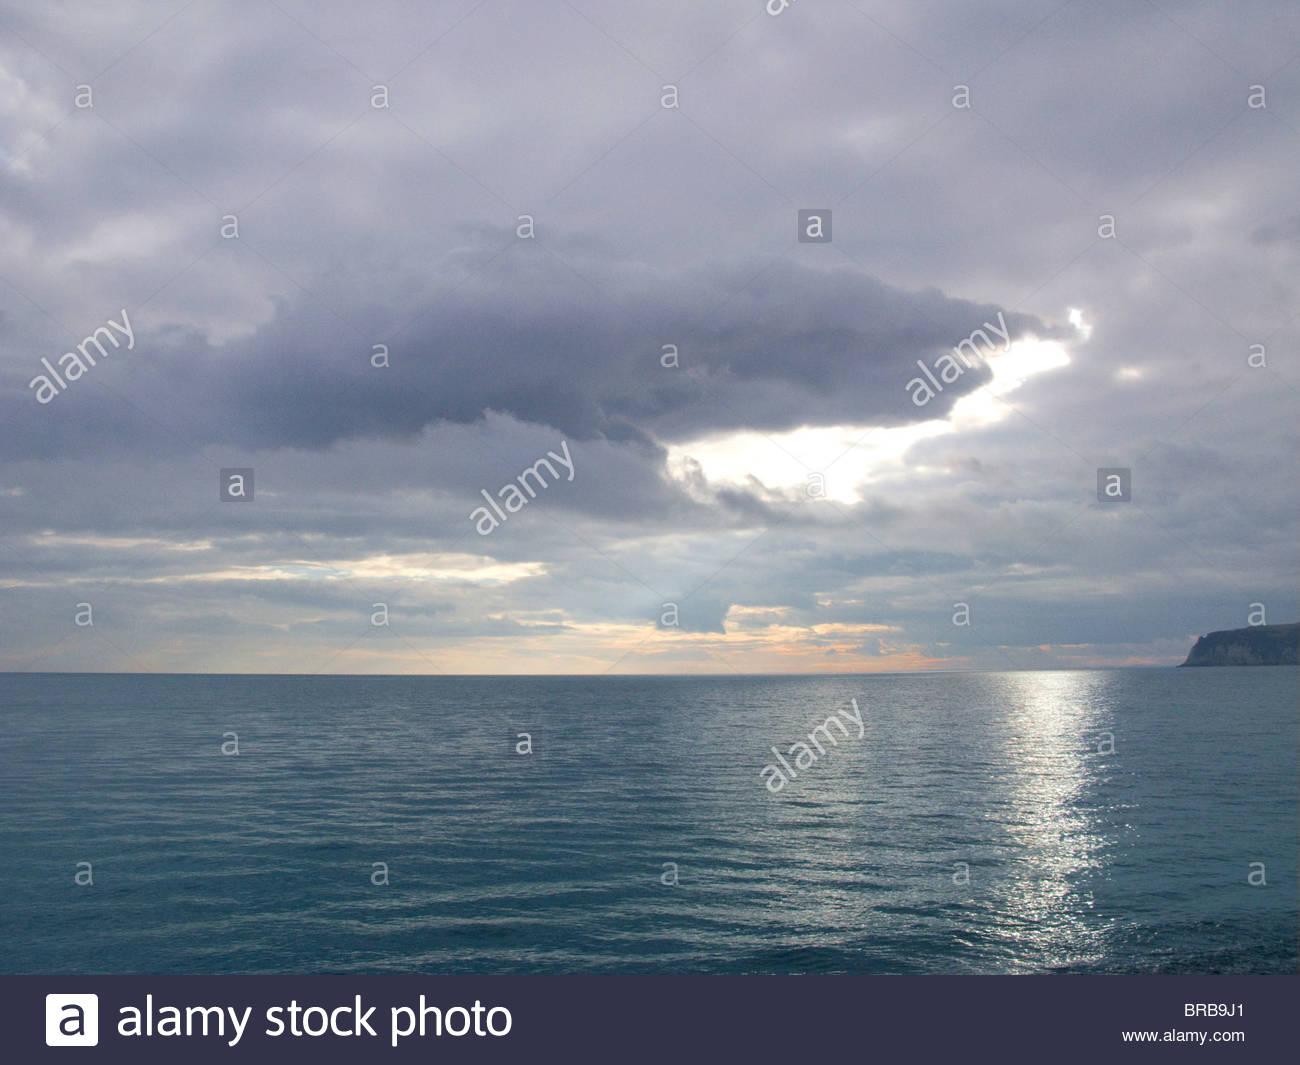 Overcast sky over tranquil ocean - Stock Image